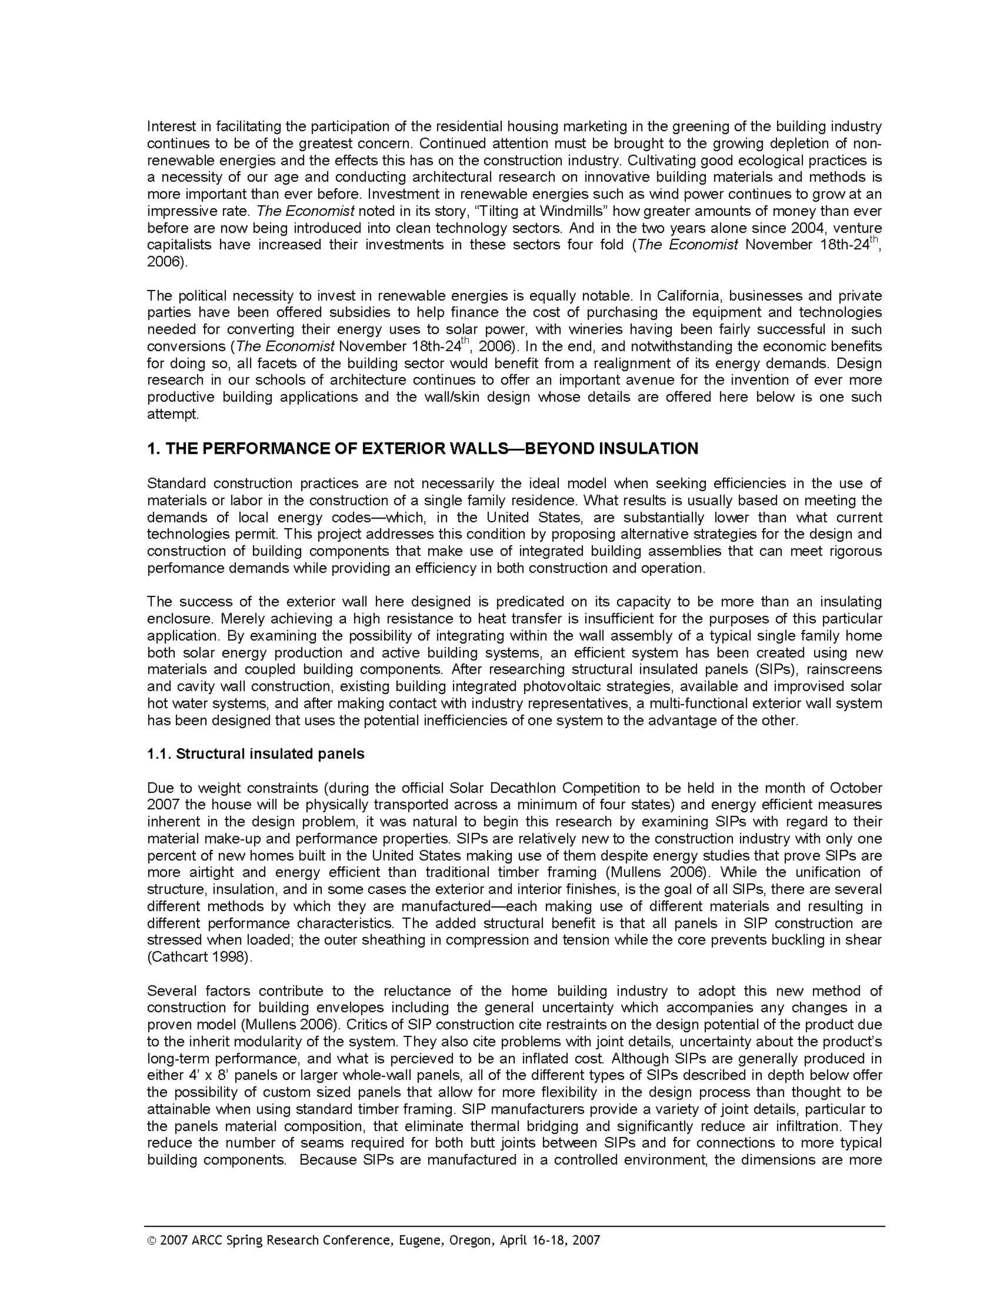 075_Page_2.jpg